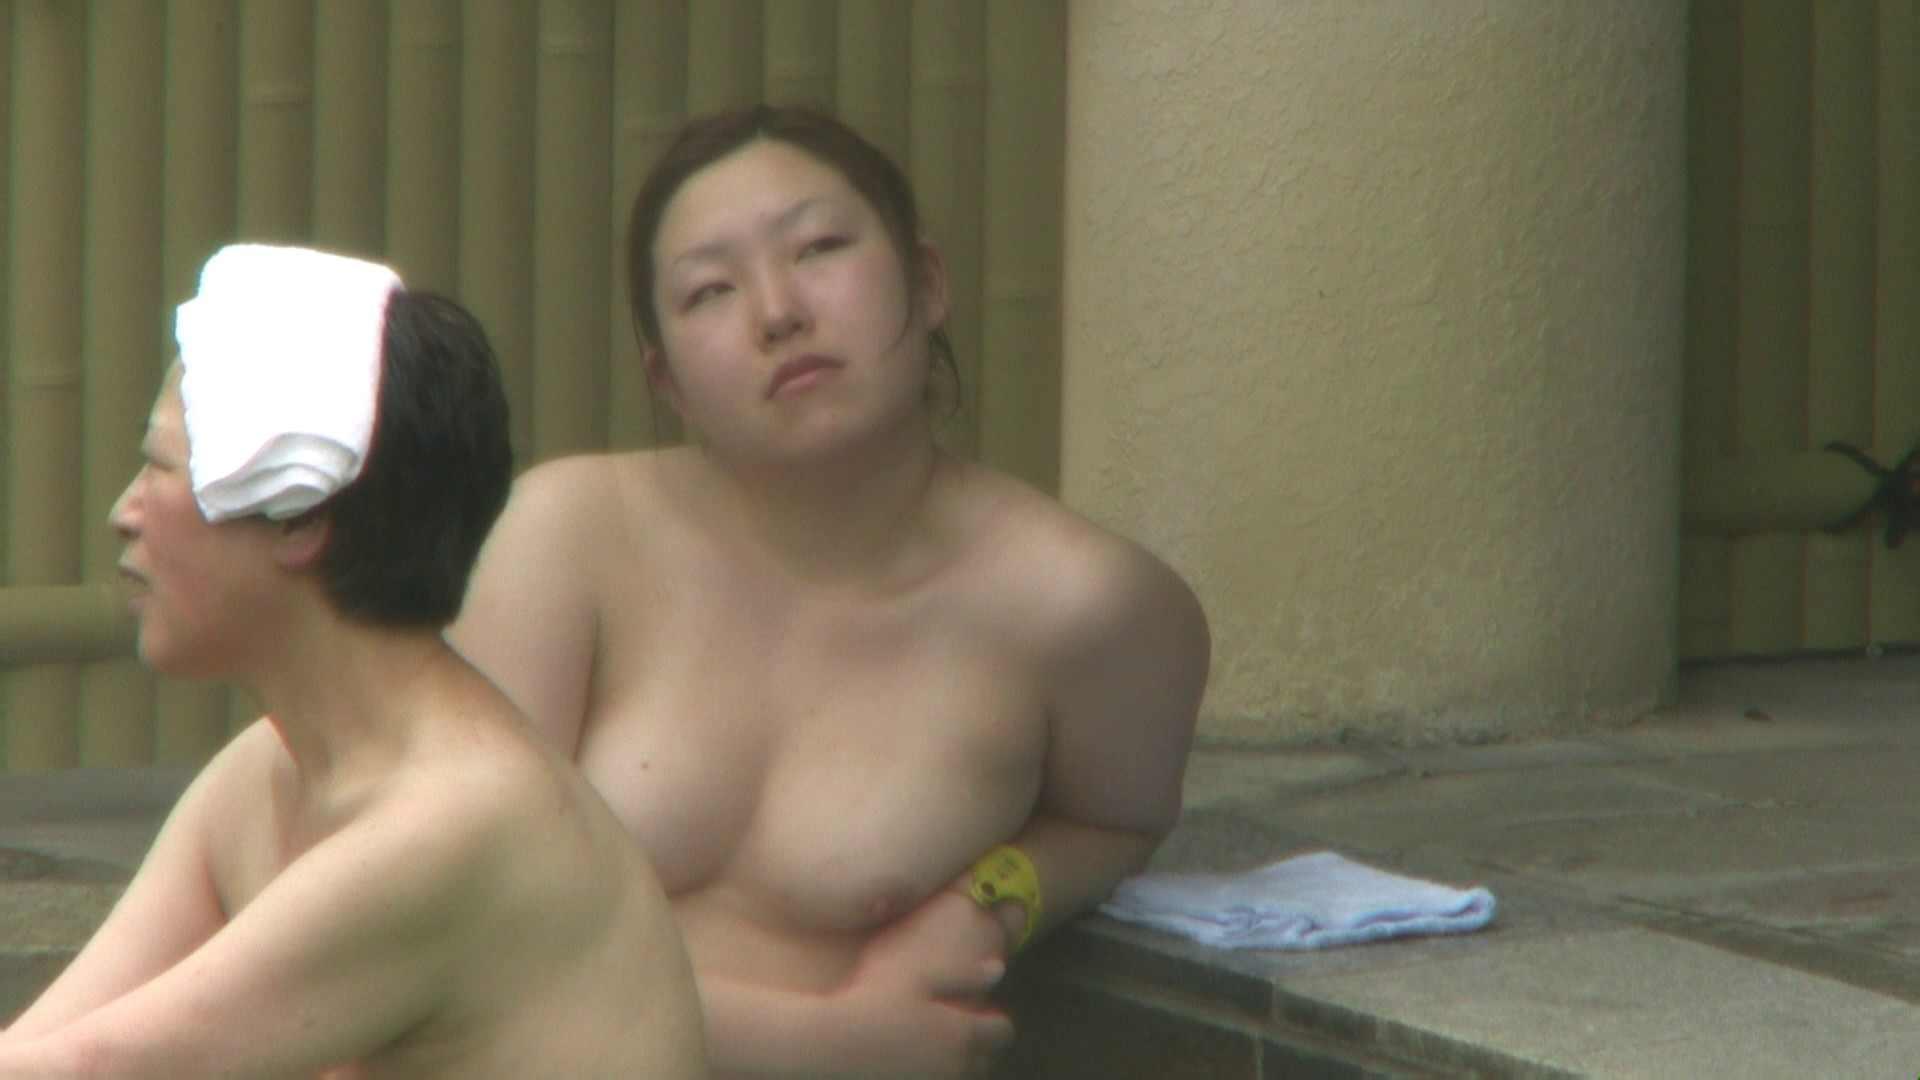 Aquaな露天風呂Vol.72【VIP限定】 露天風呂突入 | 盗撮師作品  76pic 22